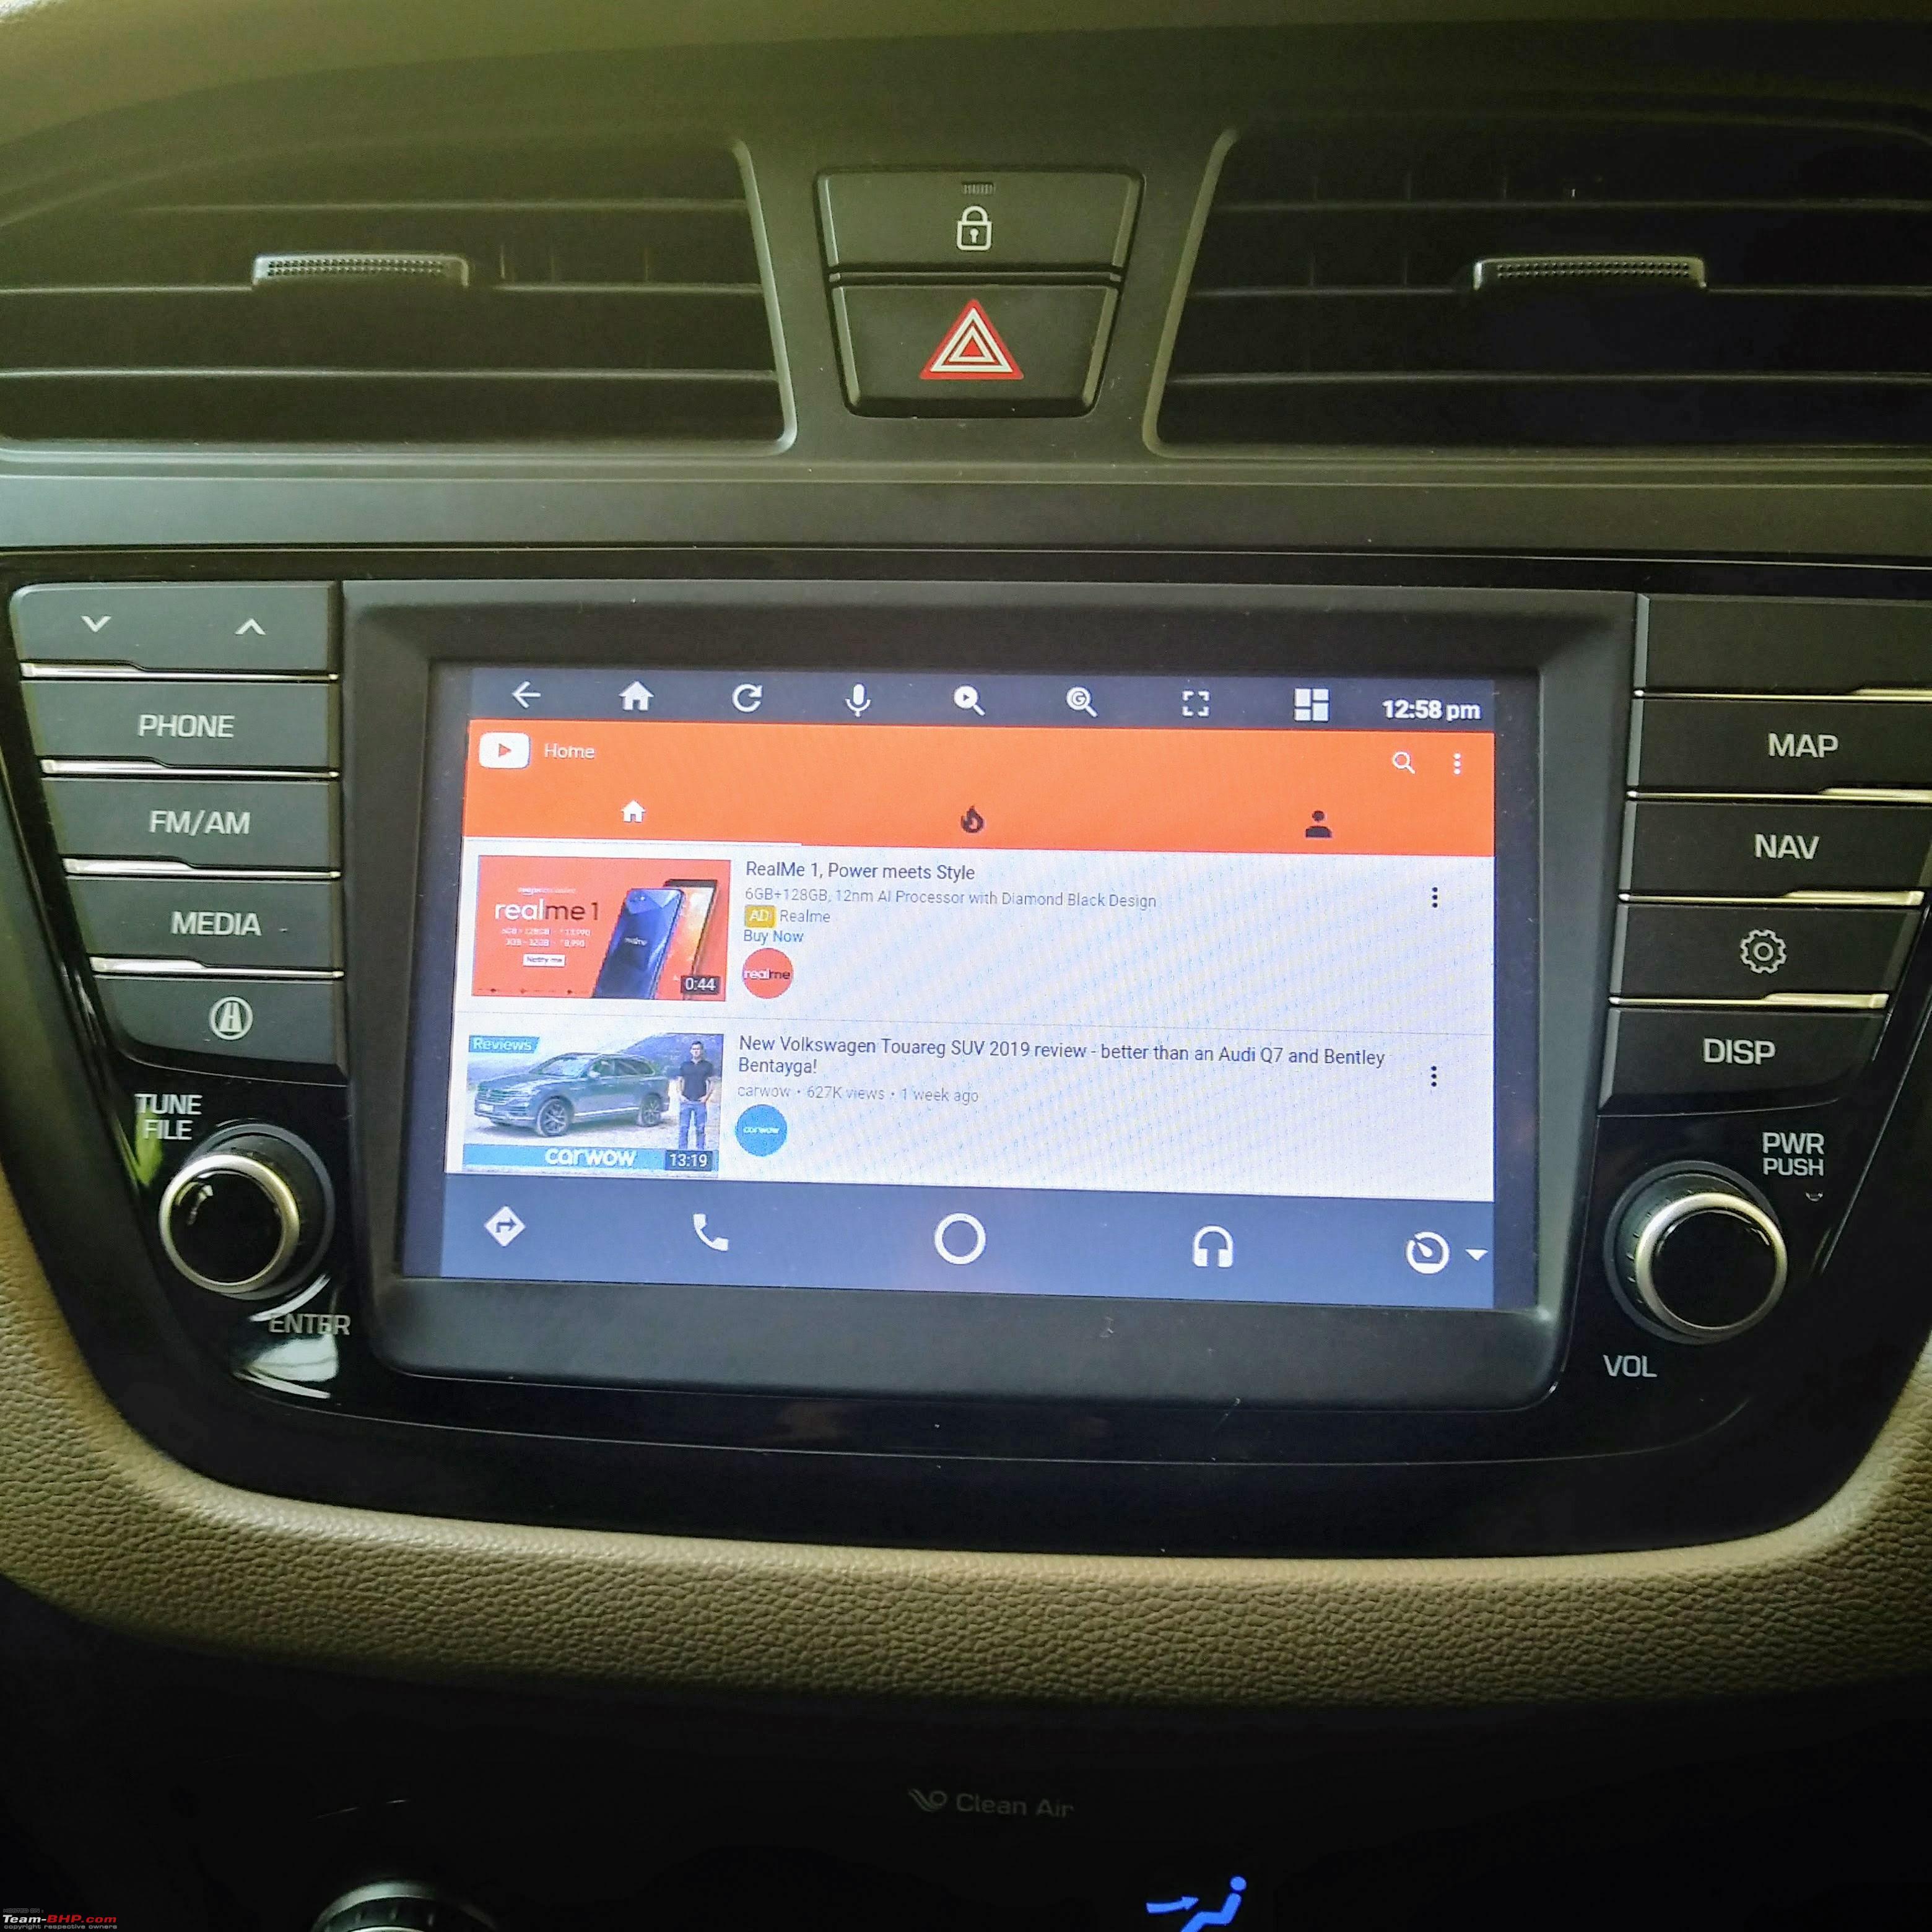 Hyundai Elite i20 : Official Review - Page 170 - Team-BHP